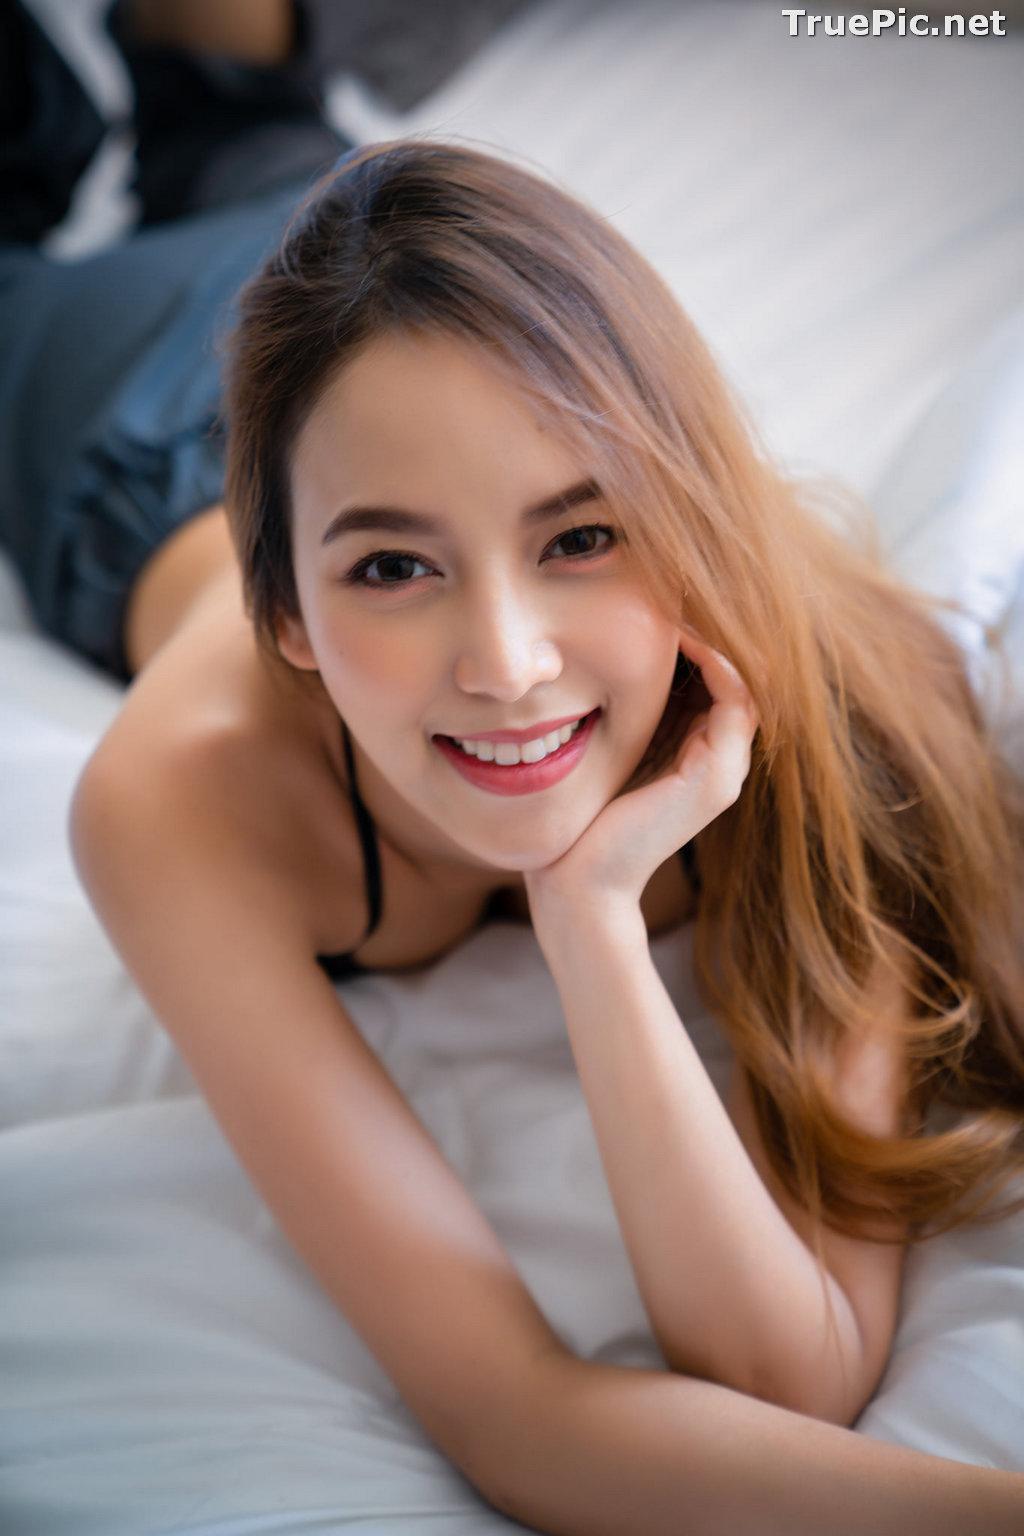 Image Thailand Model - Noppawan Limapirak (น้องเมย์) - Beautiful Picture 2021 Collection - TruePic.net - Picture-65